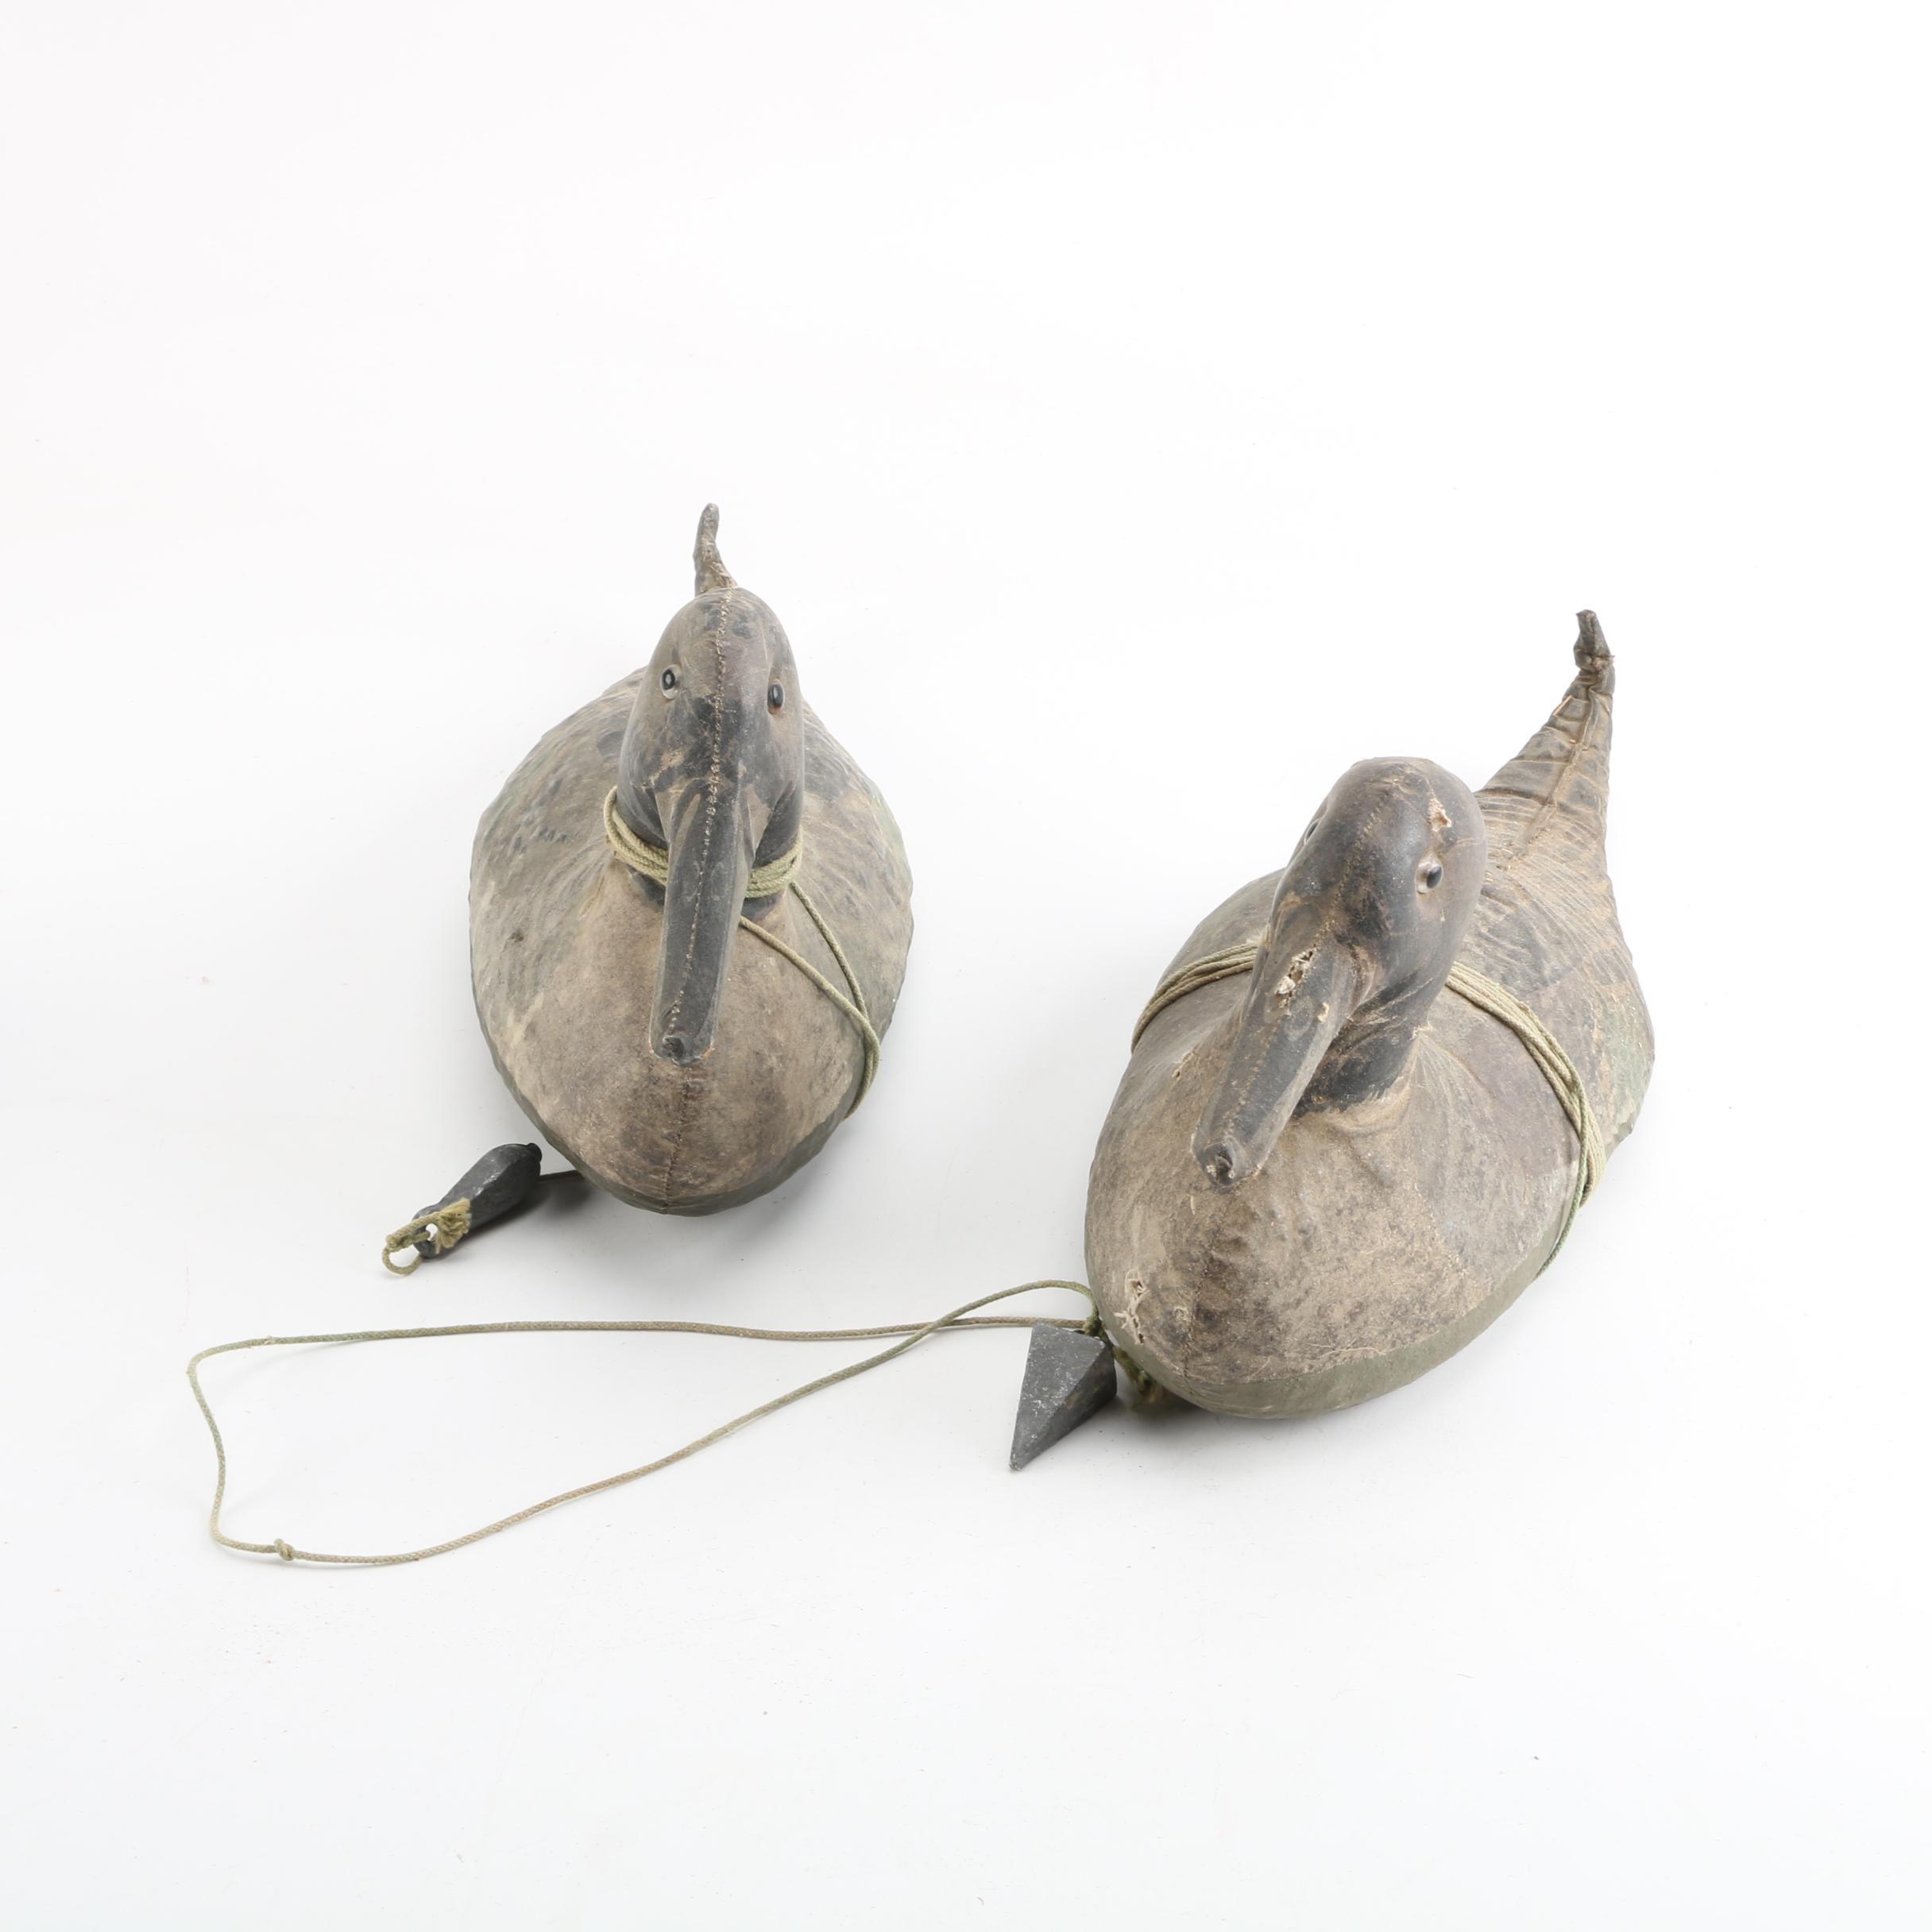 Antique Hand-Sewn Duck Decoys